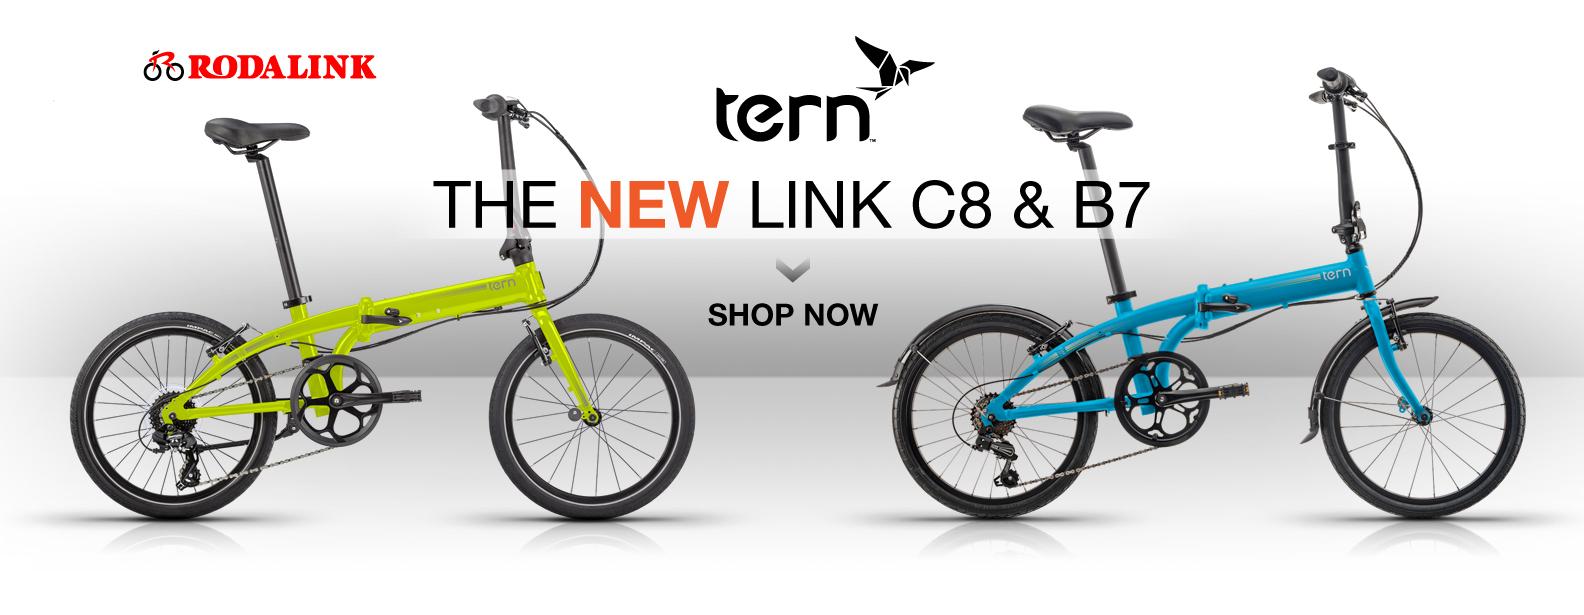 Rodalink Malaysia Bicycle Online Shop In Malaysia